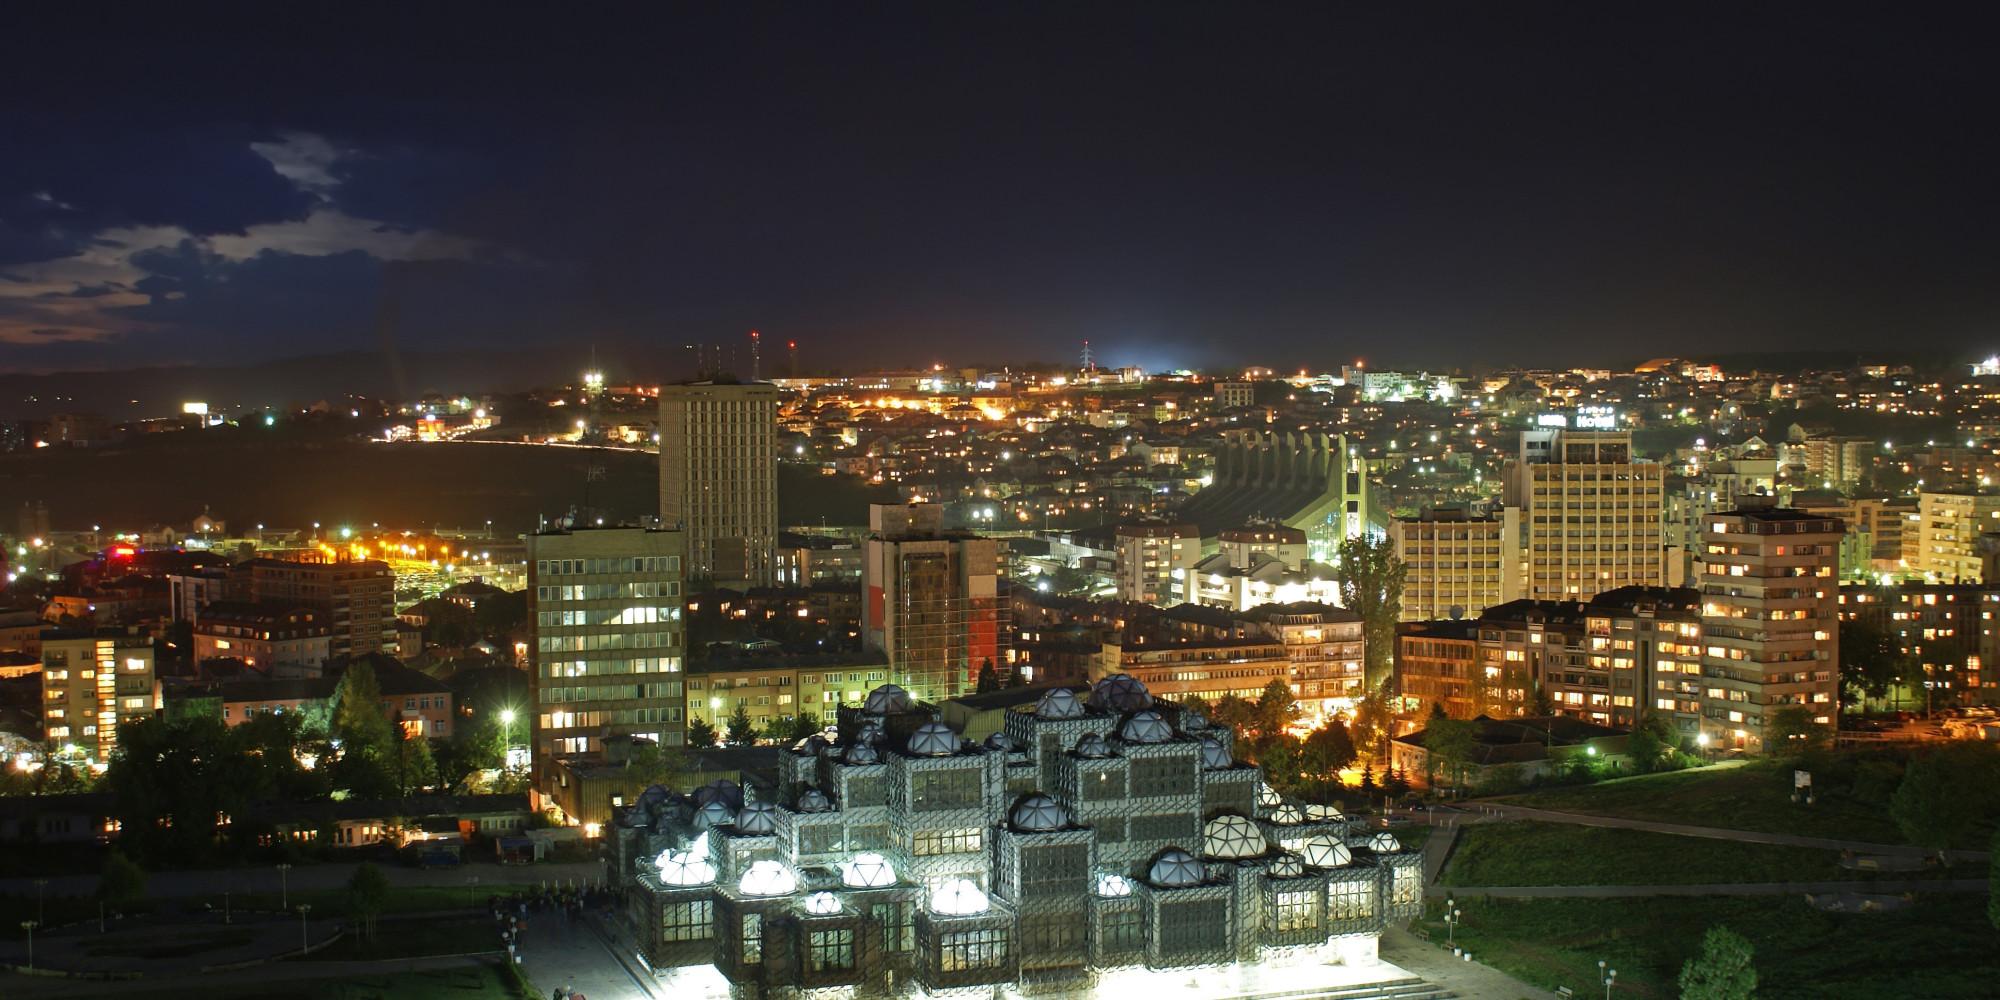 Balkan Nightscape (Prishtina, Kosovo)